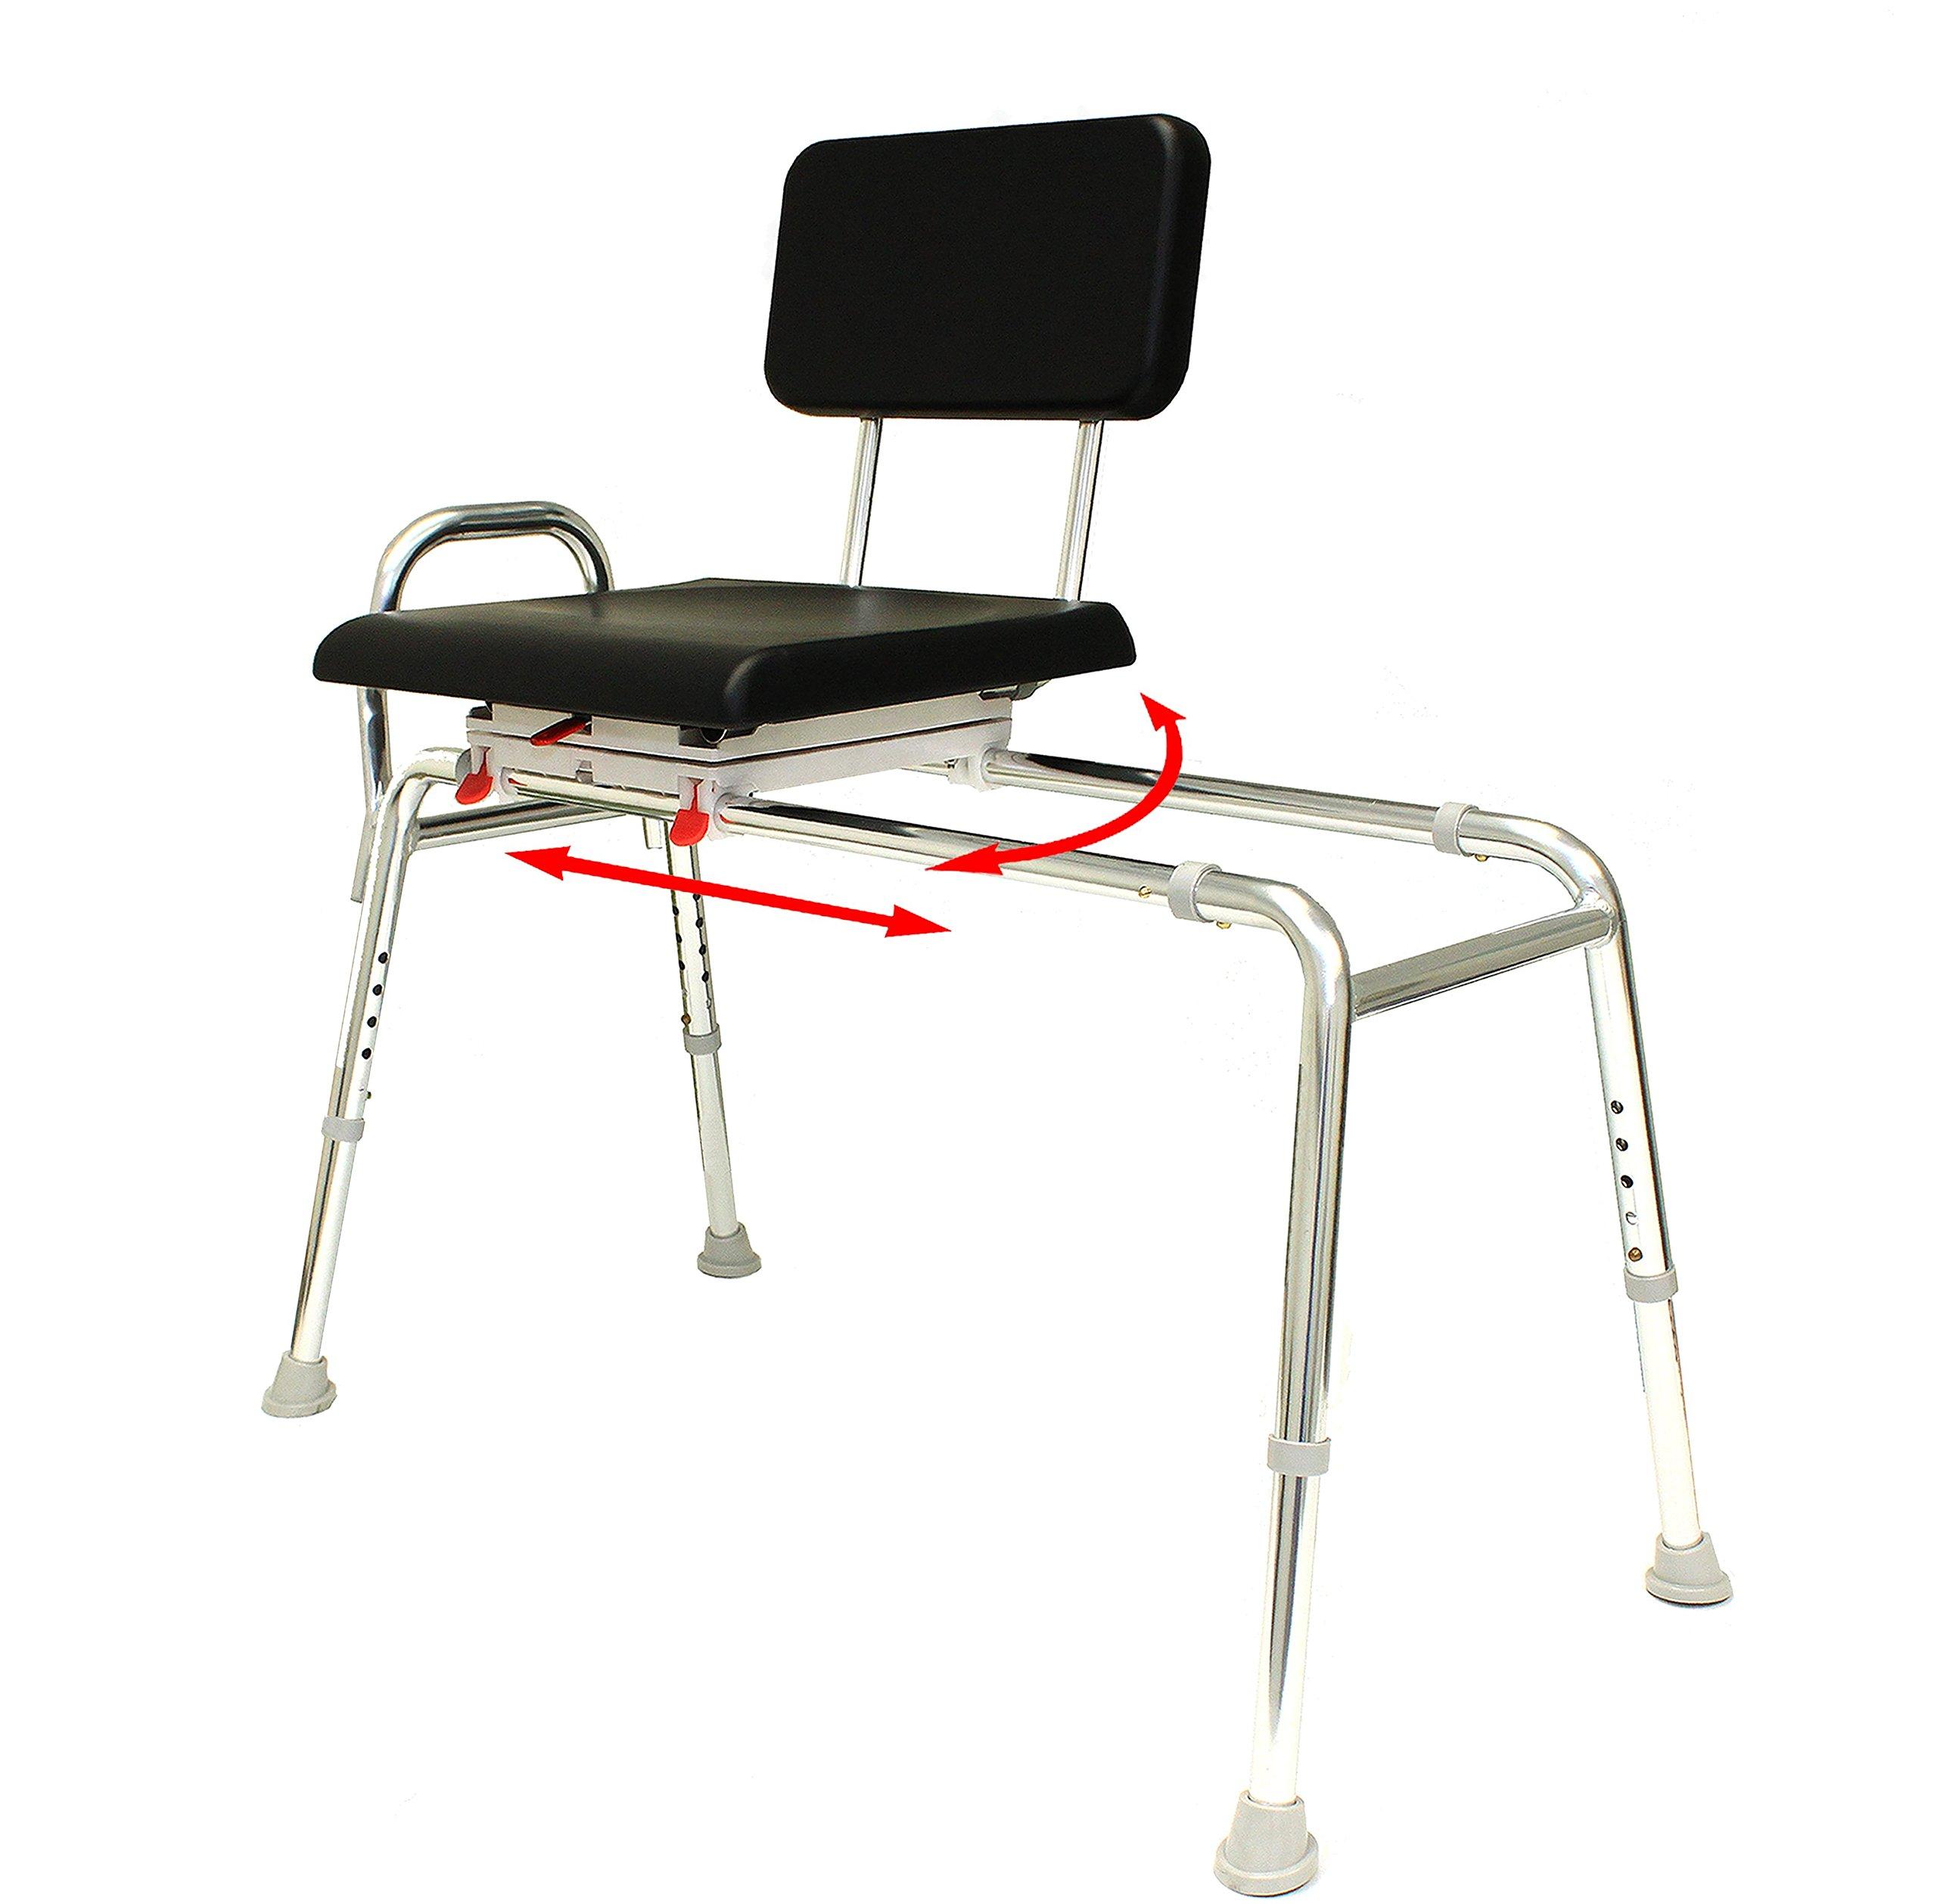 Padded Swivel Sliding Bath Transfer Bench (77691) - X-Long (Base Length: 48'' - 49'') - Heavy-Duty Shower Bathtub Chair - Eagle Health Supplies